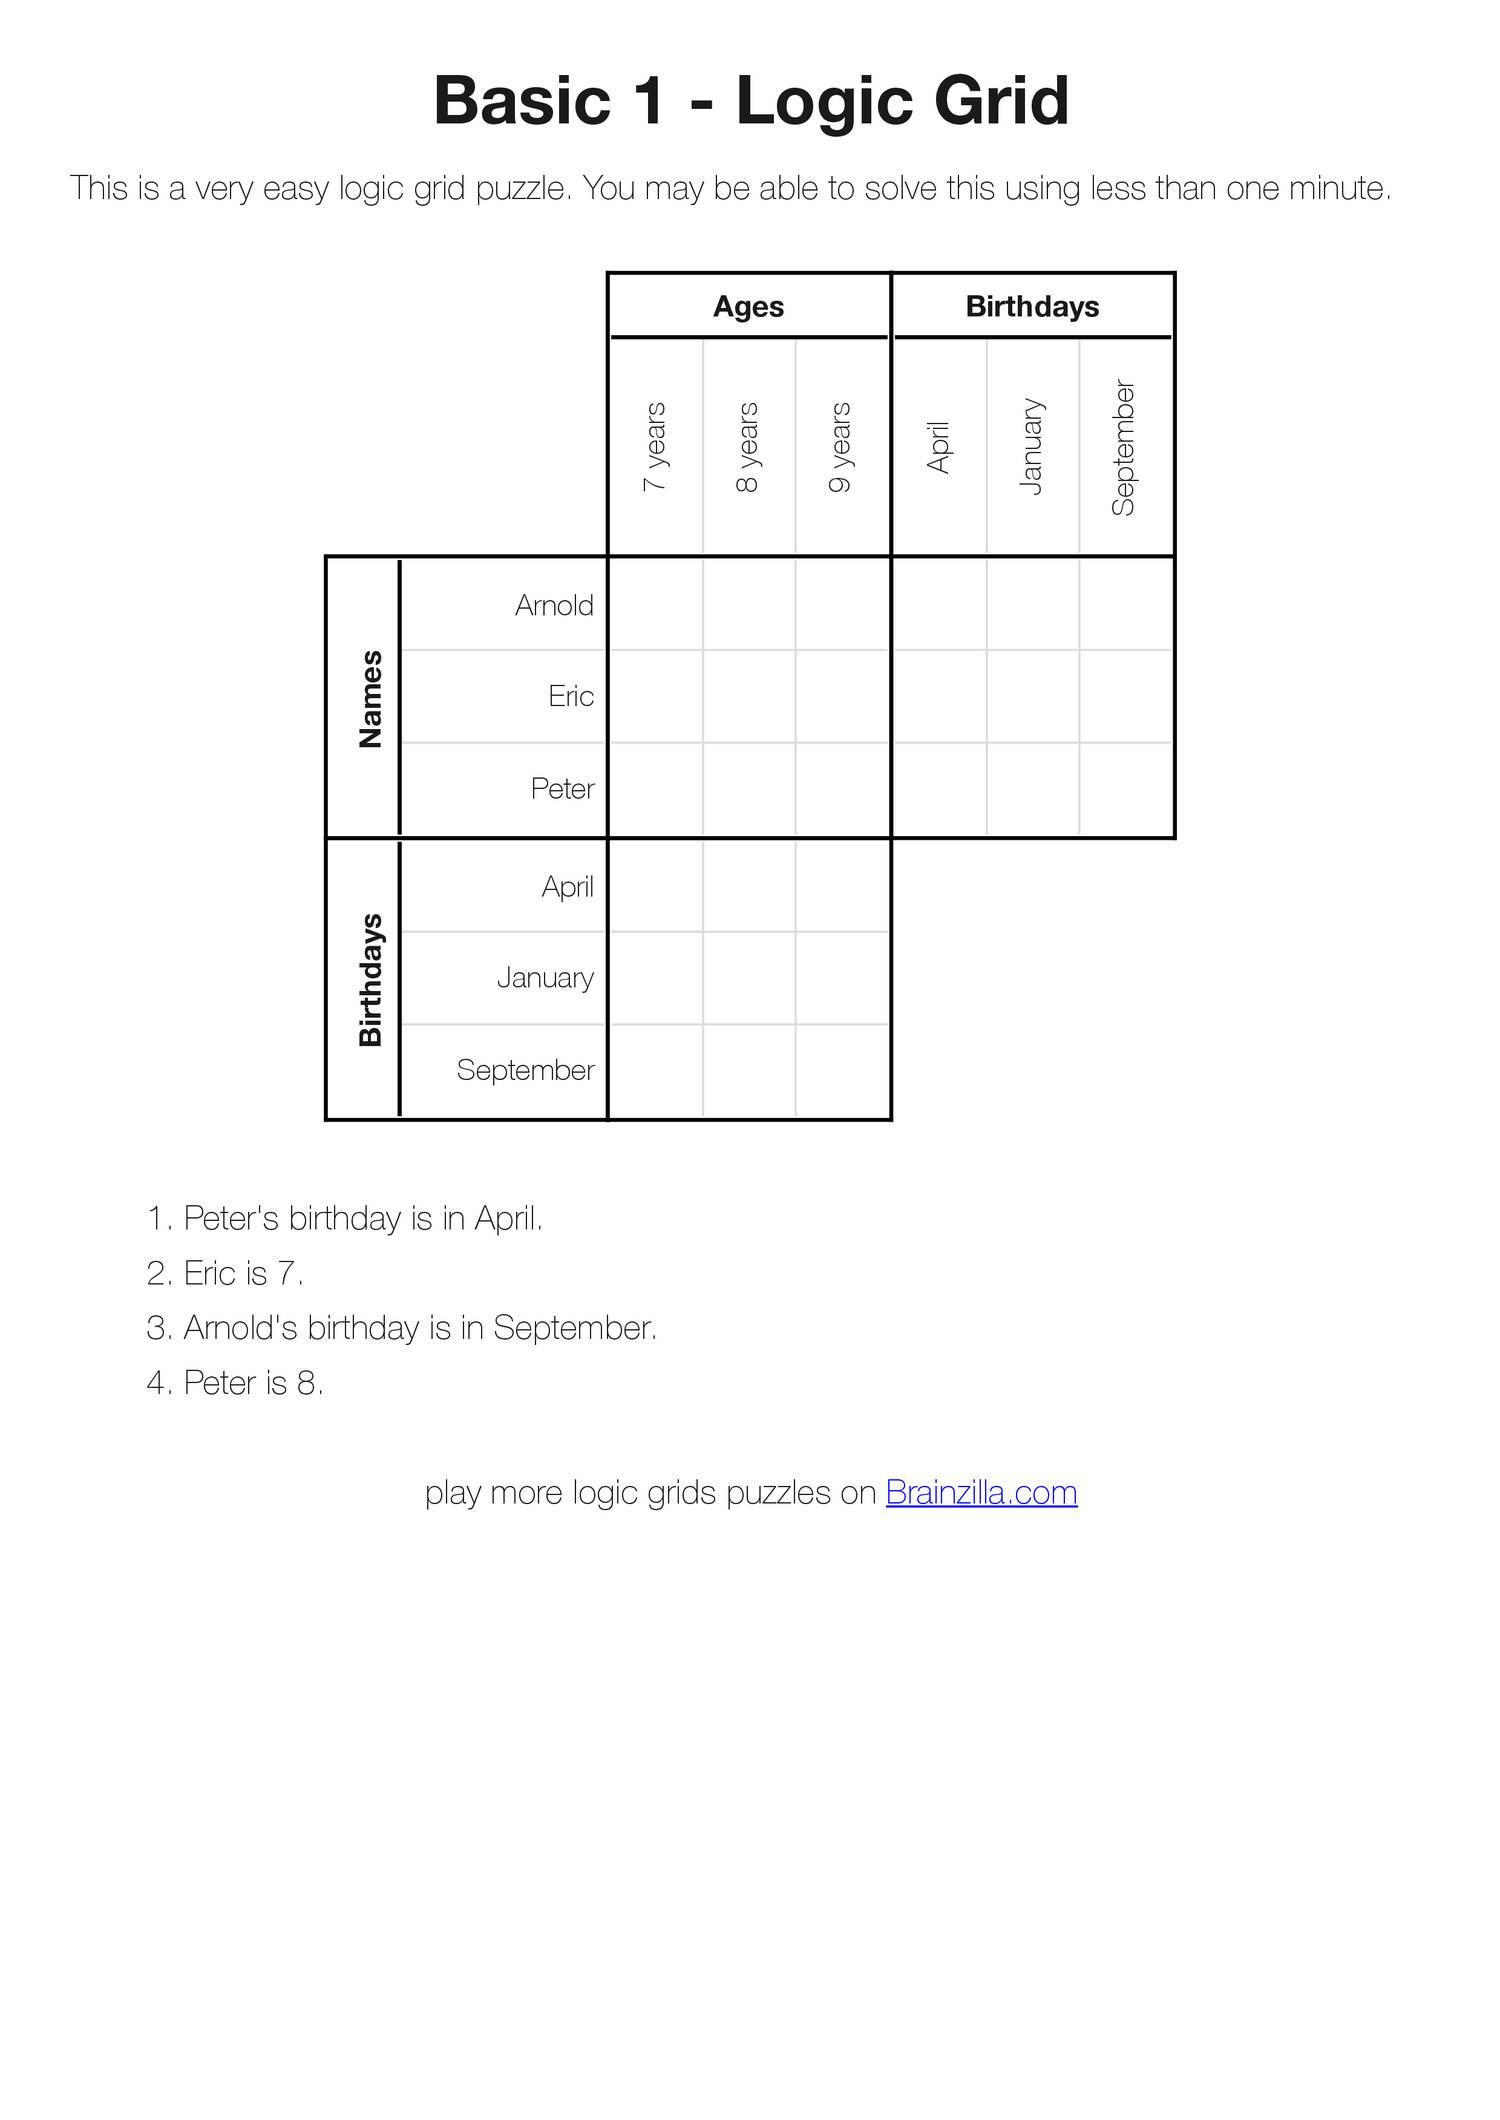 Printable Logic Grid Puzzles (Brainzilla).pdf | Docdroid - Printable Logic Puzzles Grid